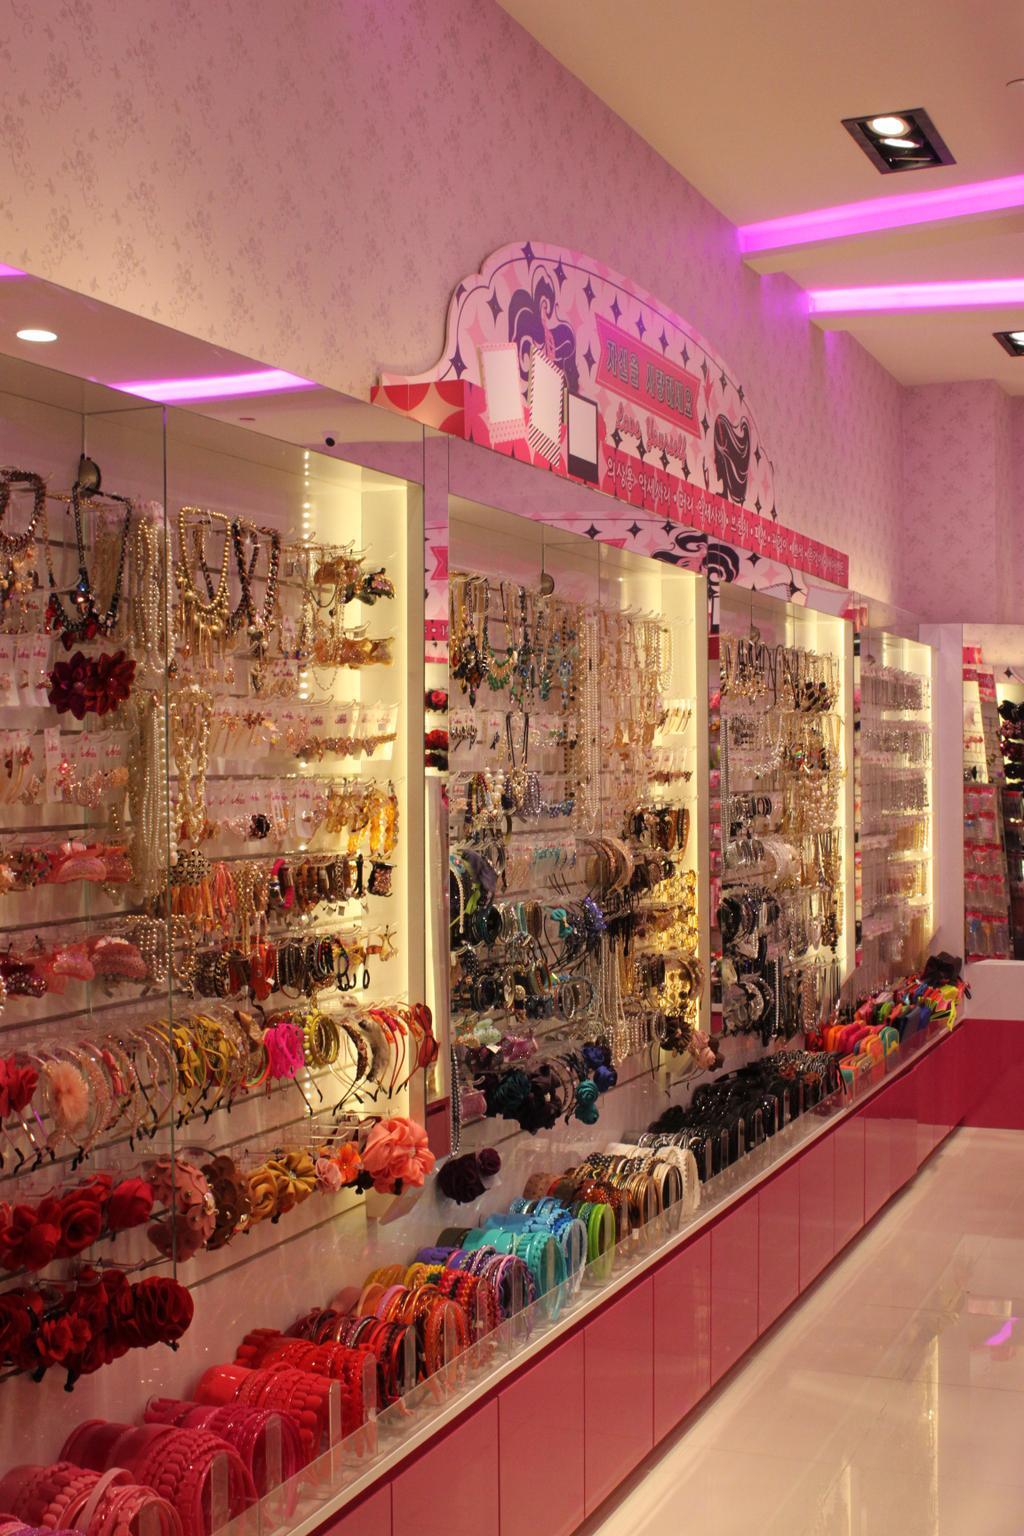 Aries (Westgate), Commercial, Interior Designer, Le Interi, Traditional, Pink Lighting, Pink Cabinets, Showcase Shelf, Display Shelf, Recessed Lighting, Accessories Display, Cake, Dessert, Food, Jar, Pottery, Vase